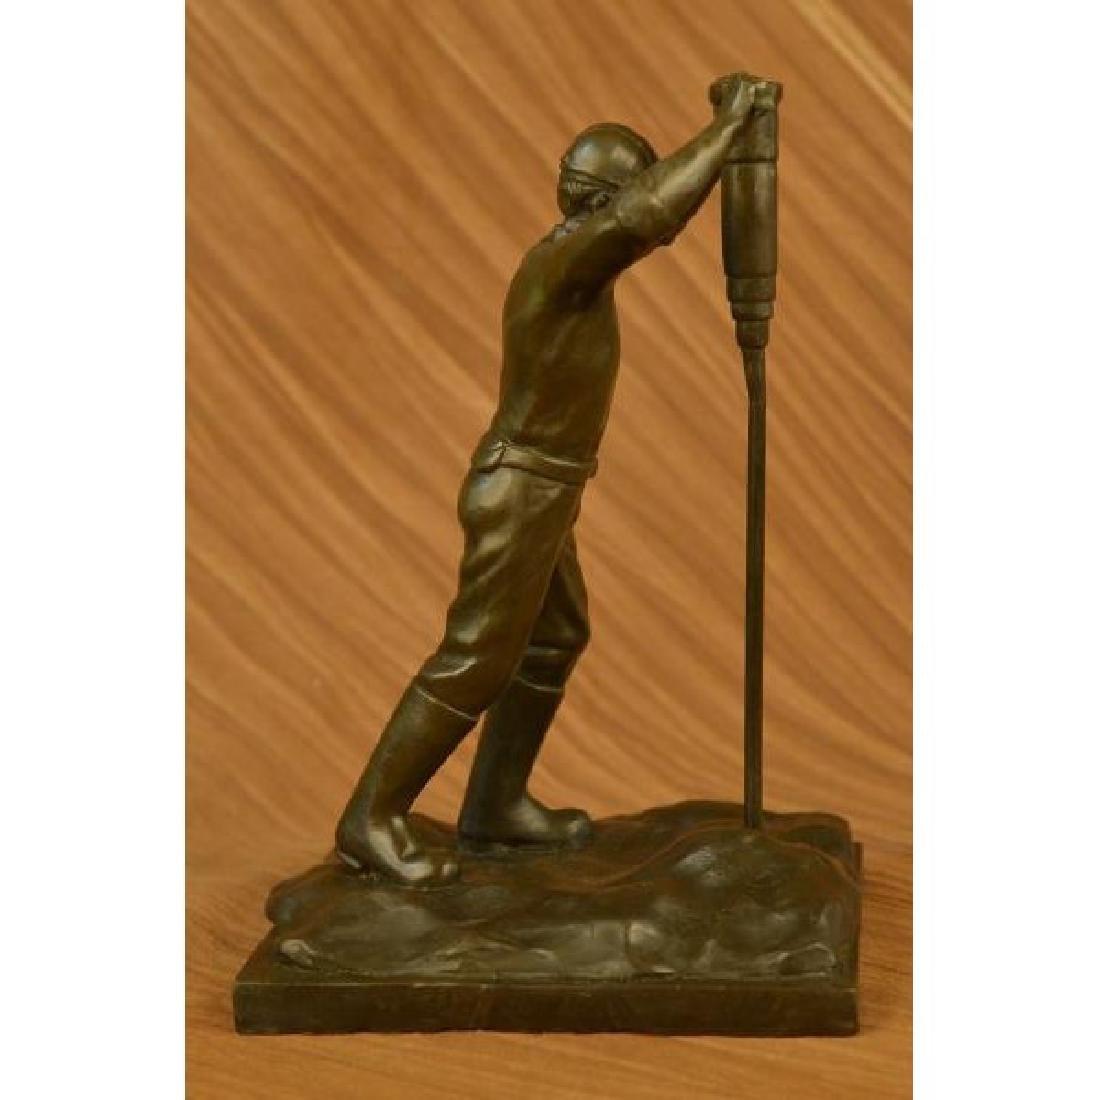 The Roughneck bronze sculpture depicting an oil field